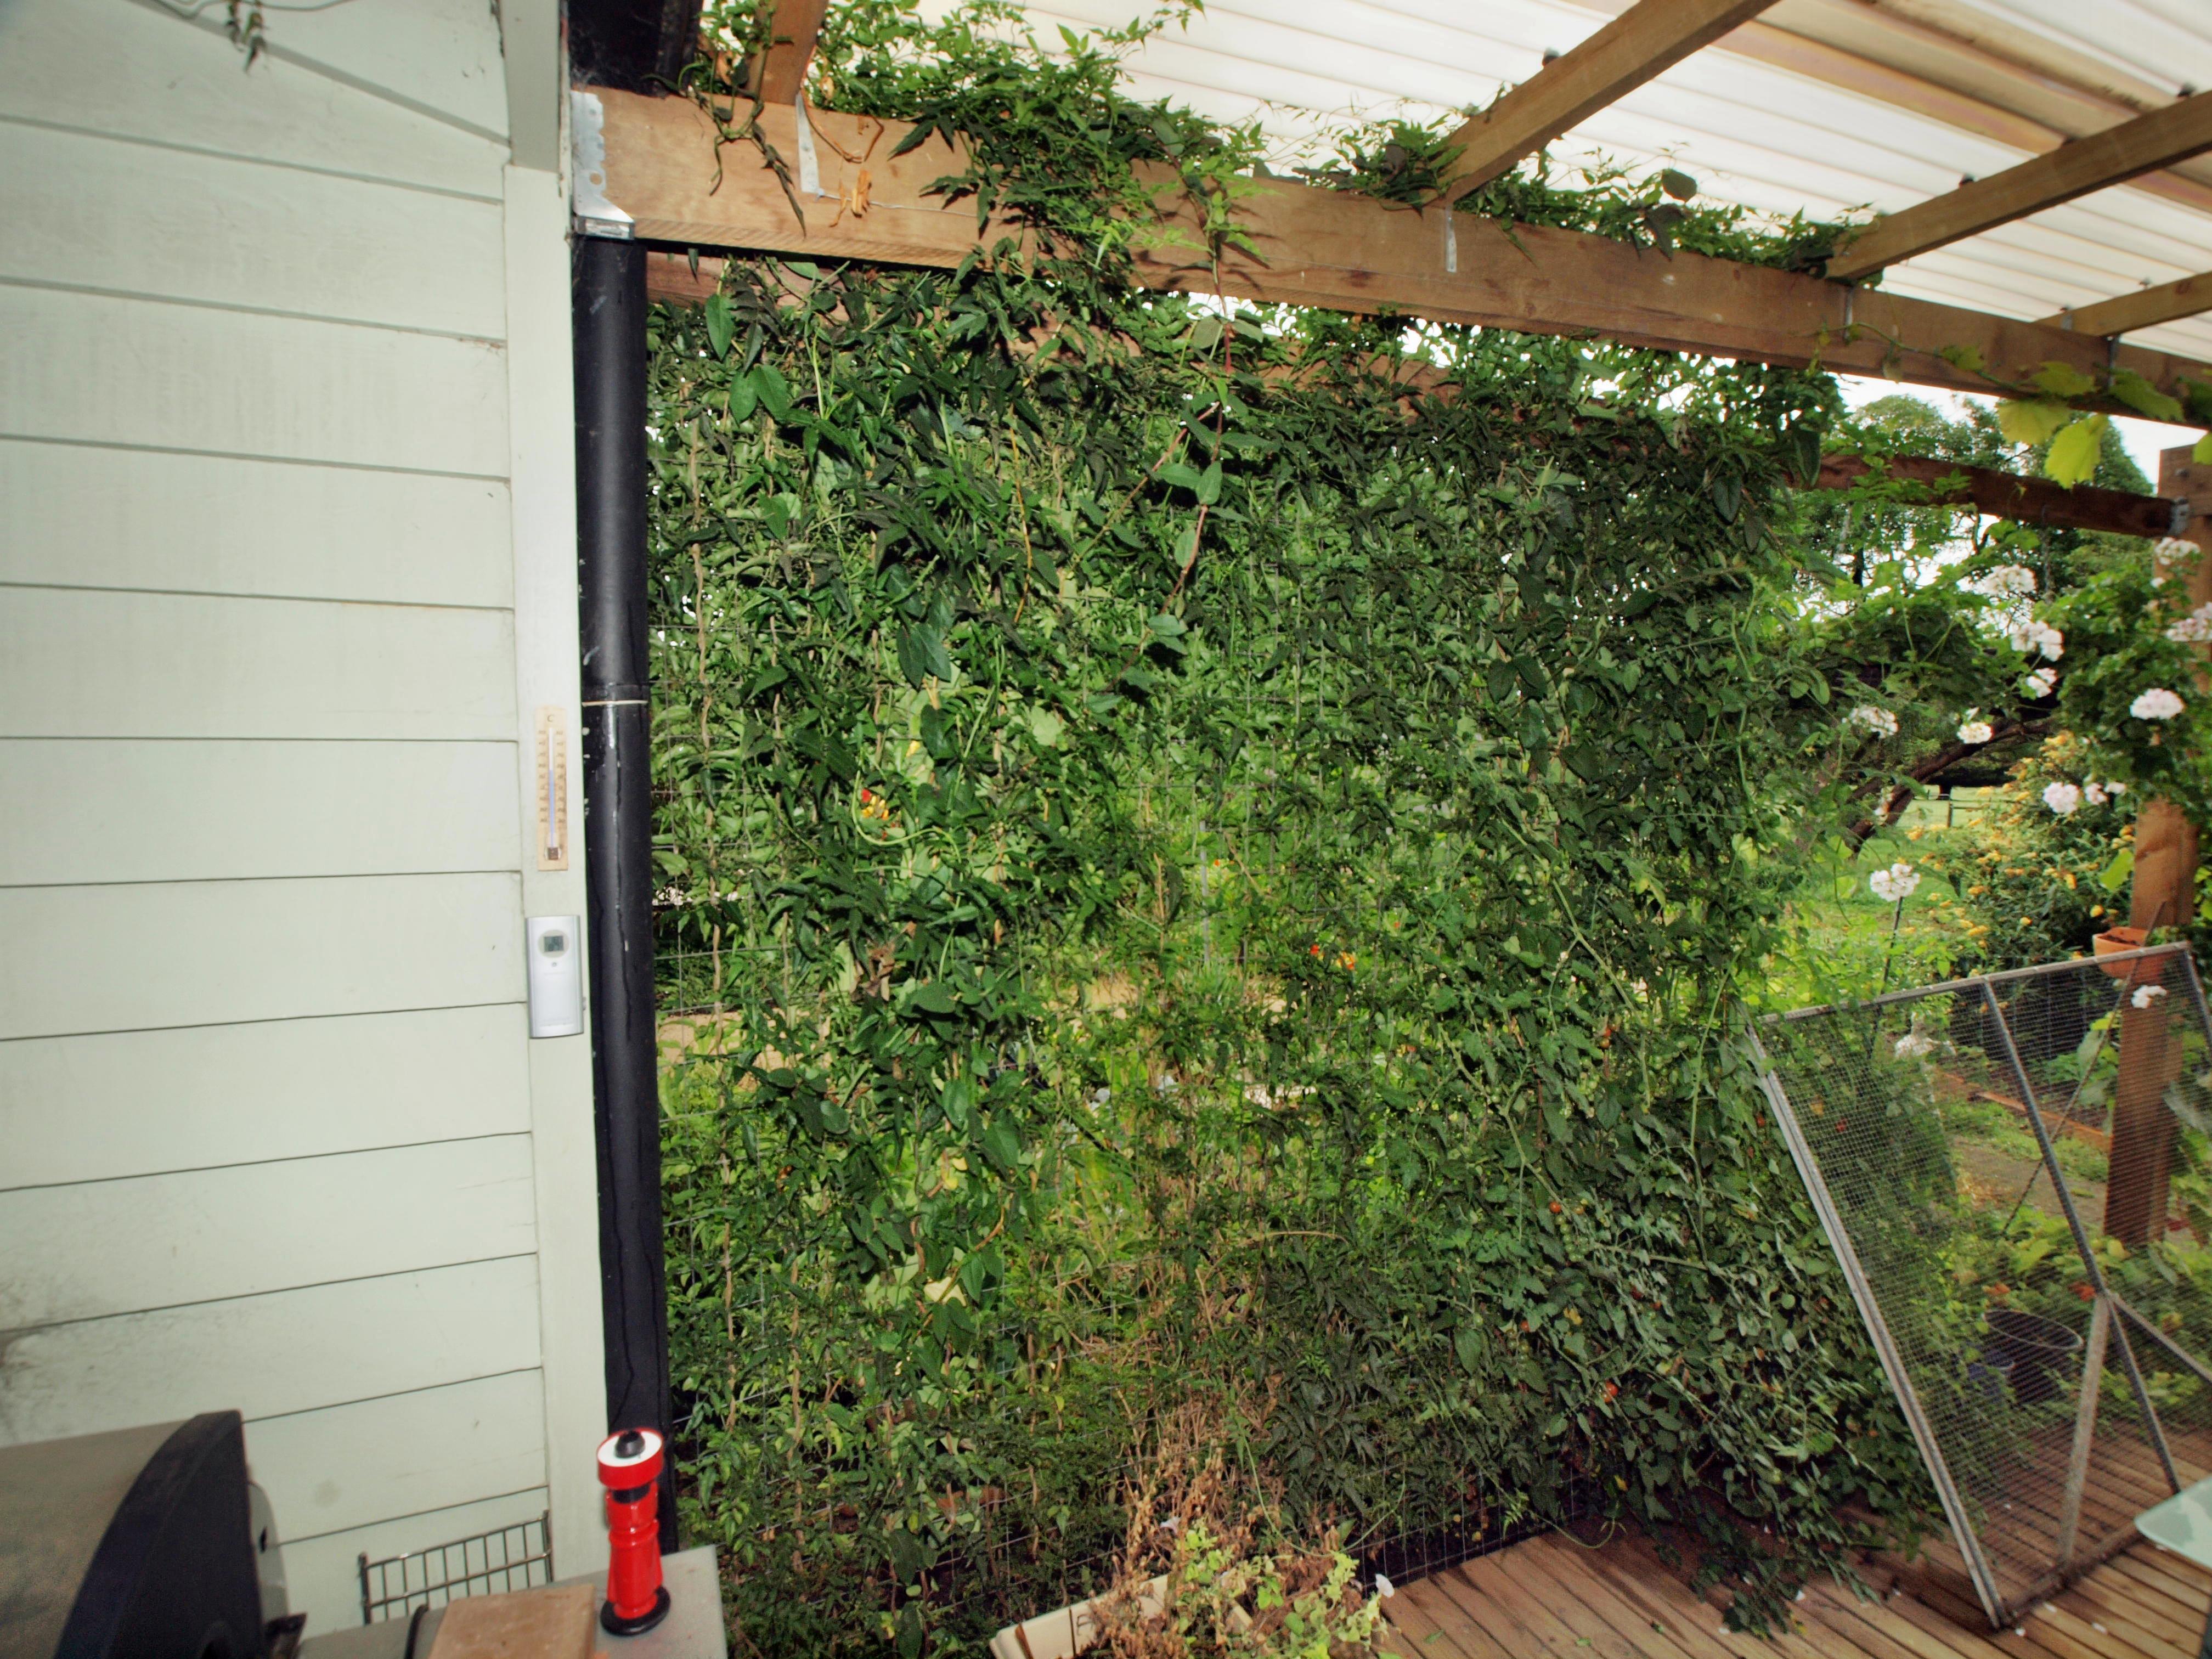 This should be verandah-1.jpeg.  Is it missing?